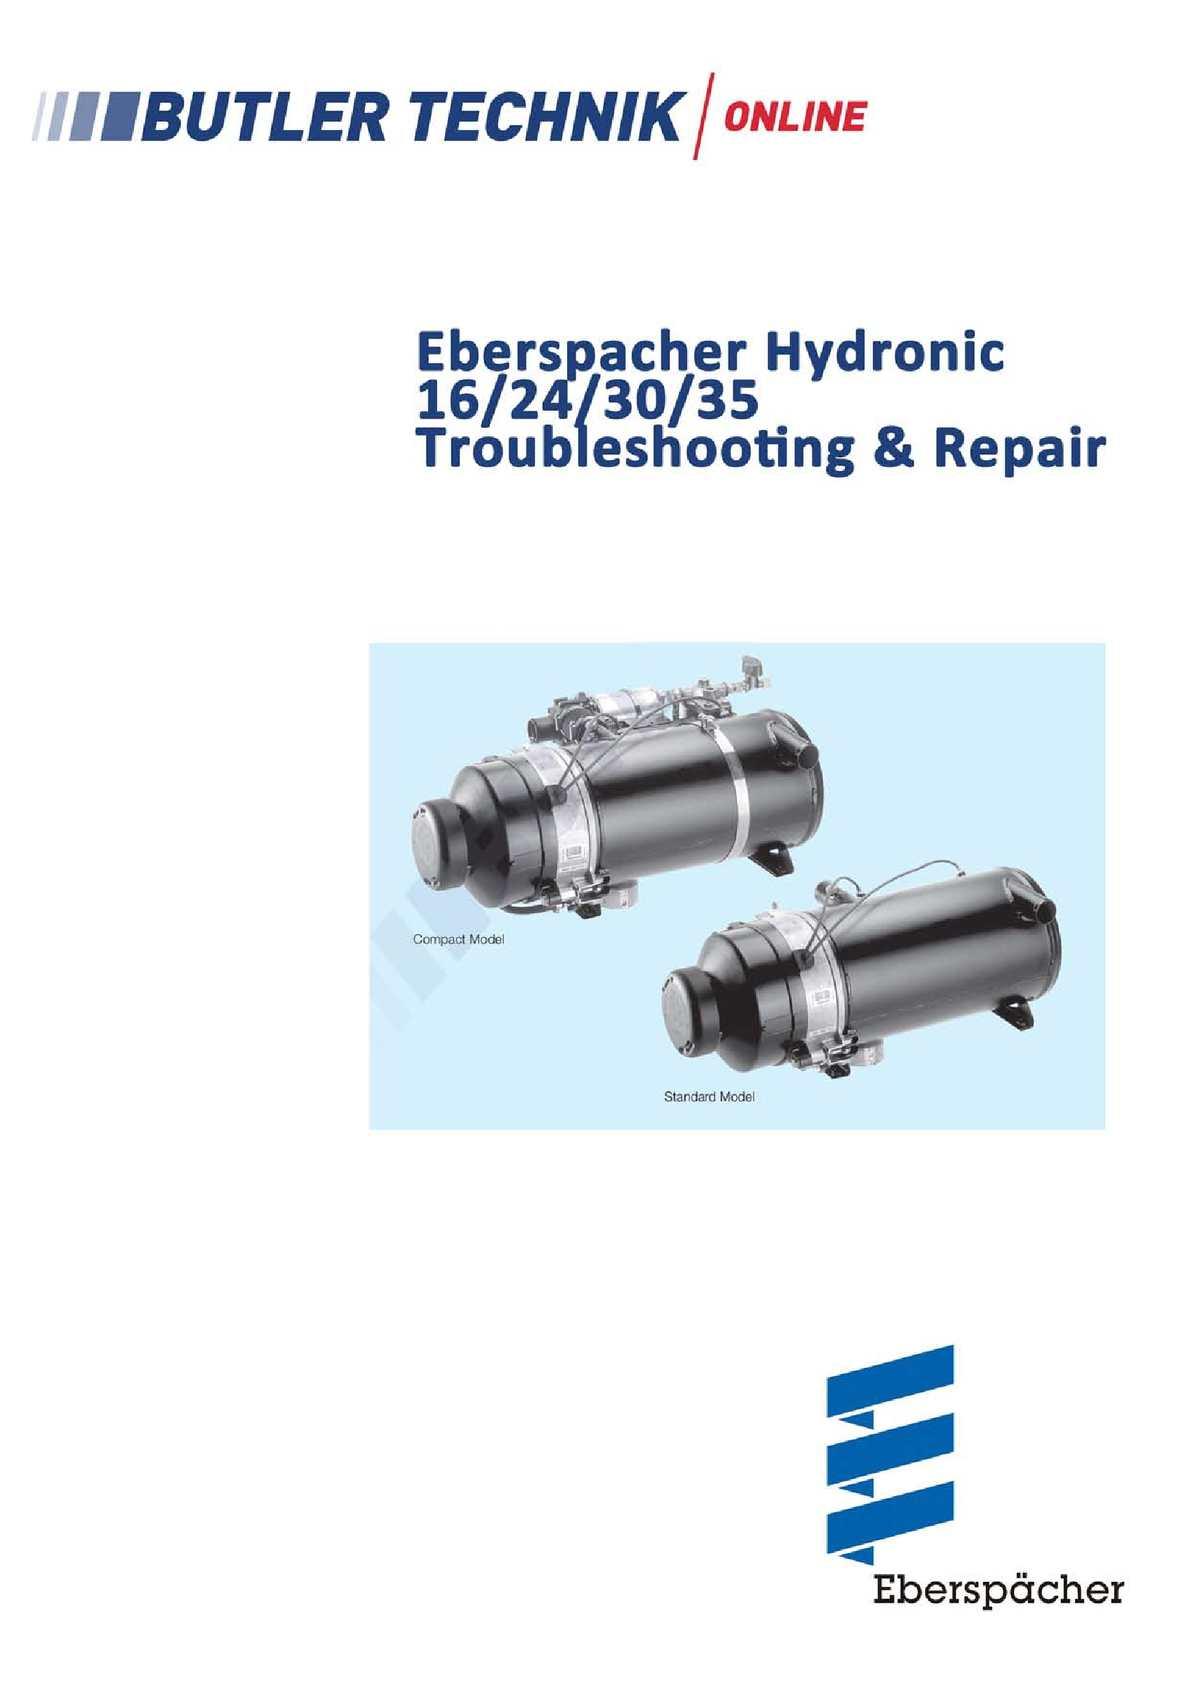 Calaméo - Eberspacher Hydronic 30 Workshop Manual